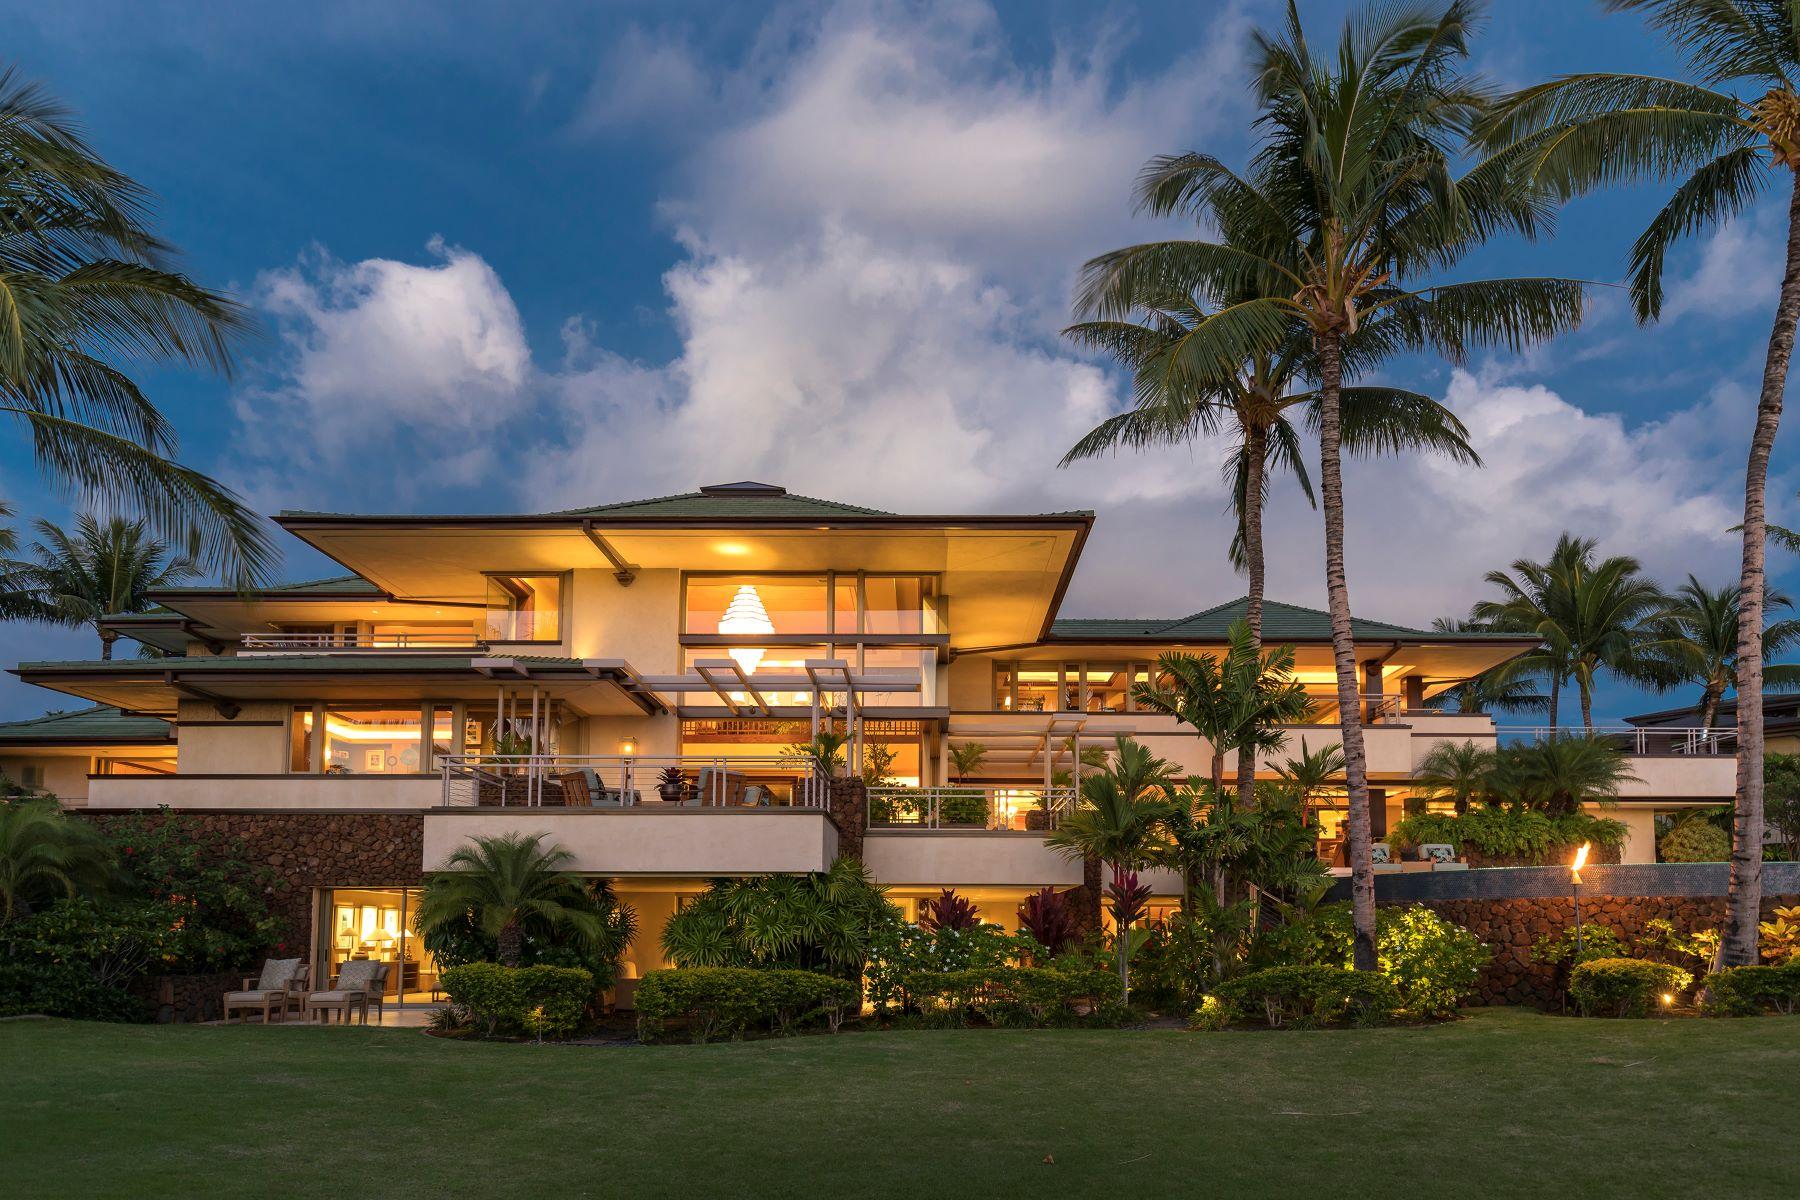 Single Family Homes para Venda às LIVE at The Bluffs at Mauna Kea 62-3692 Ki'Eki'Ena Pl, Kamuela, Havaí 96743 Estados Unidos